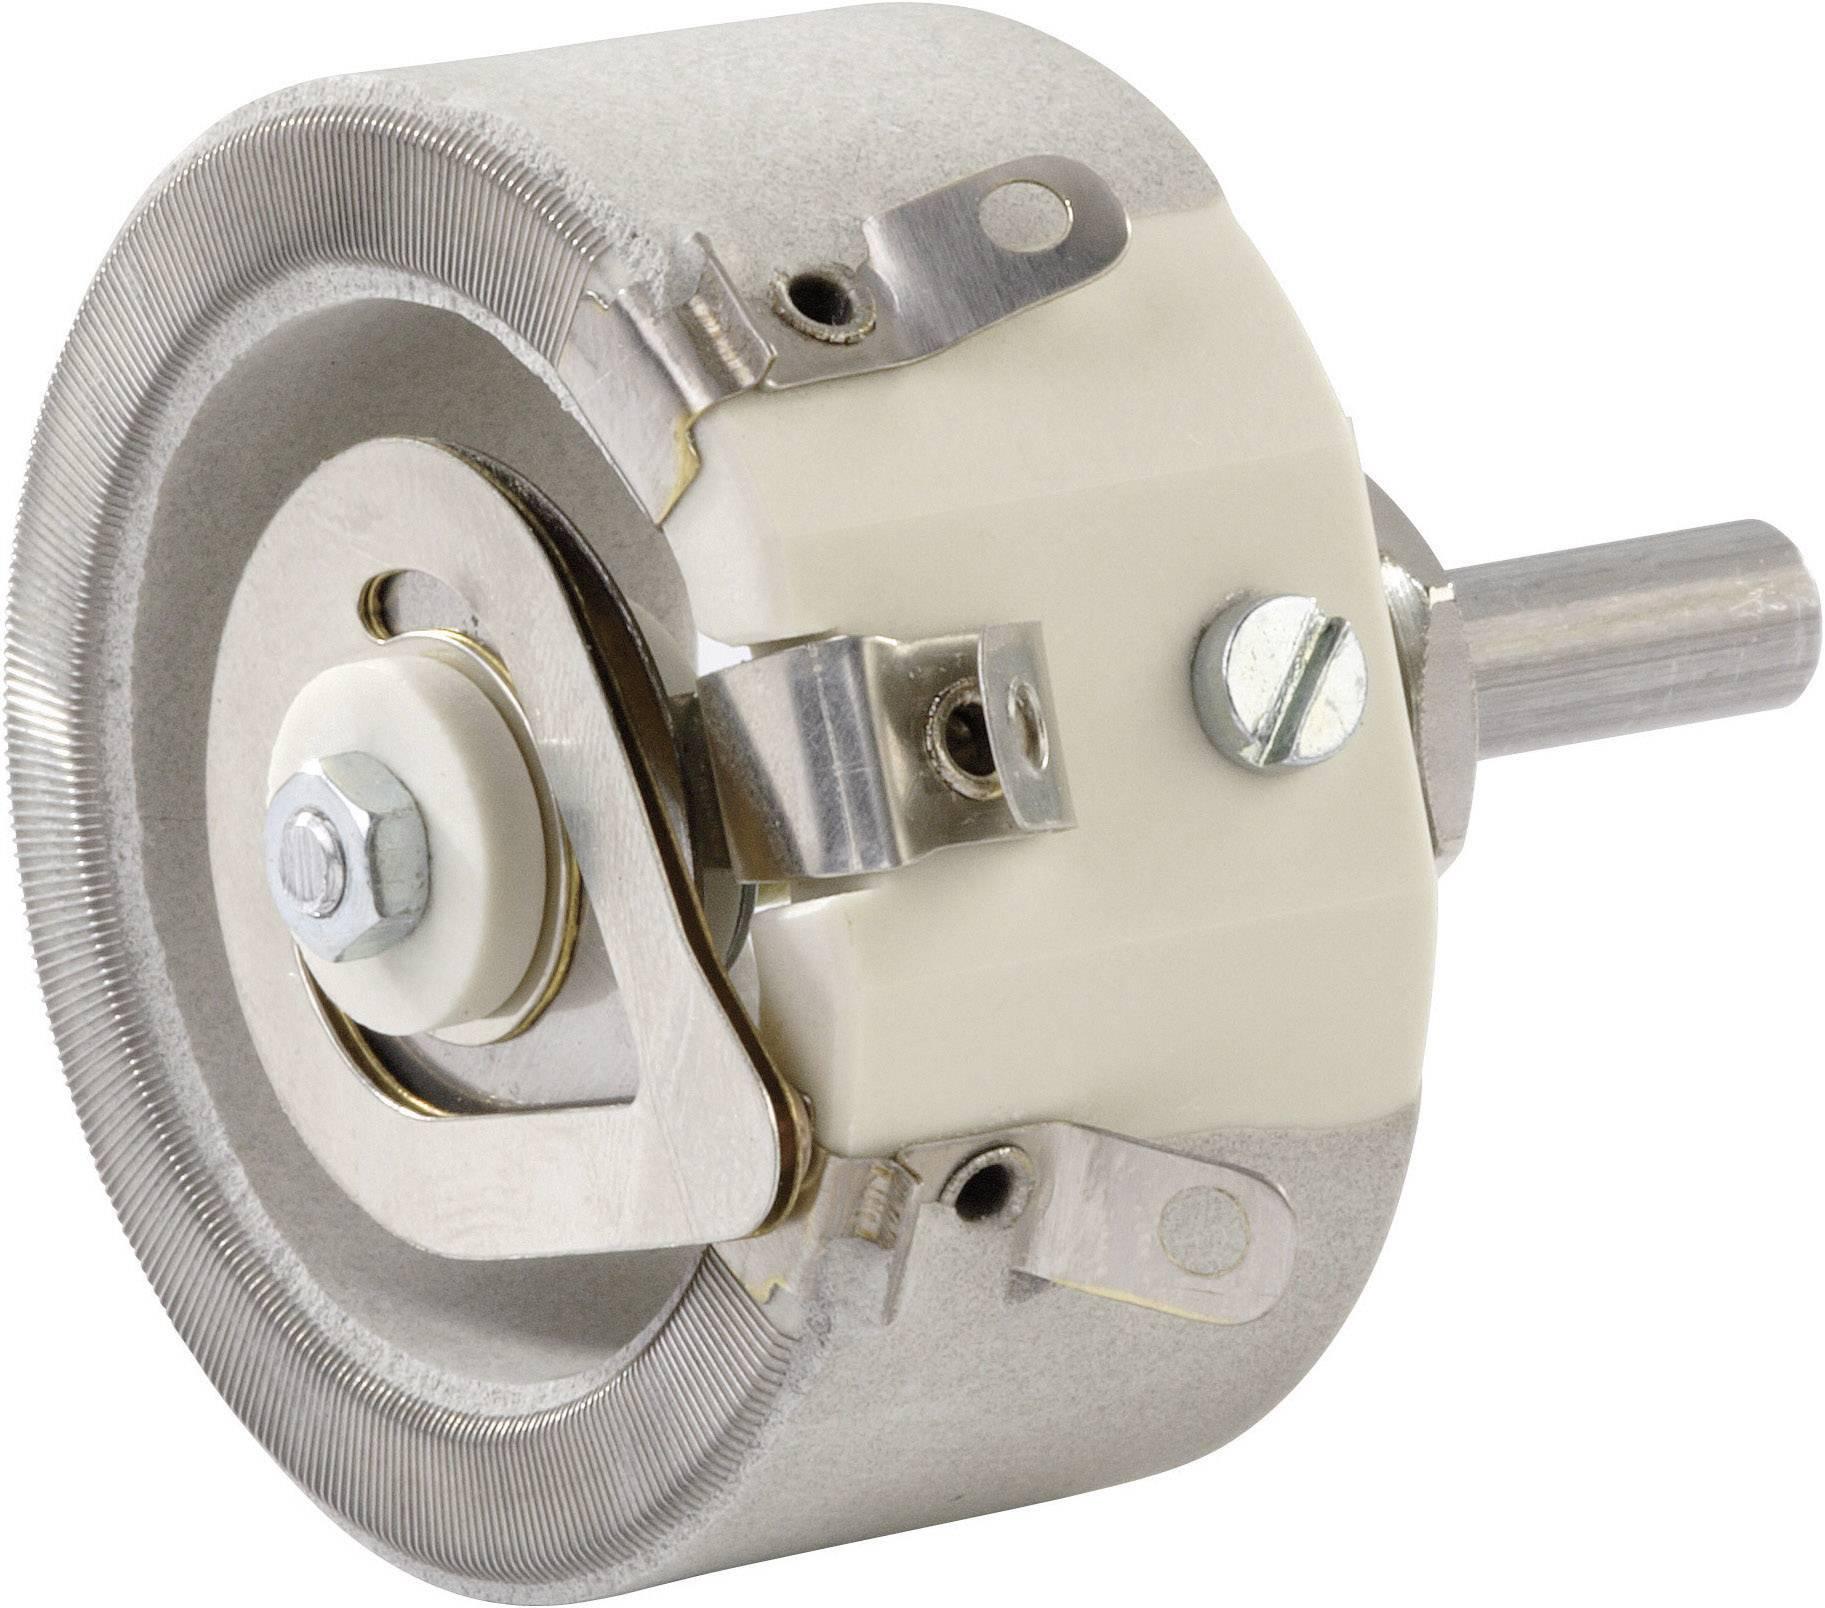 Drôtový potenciometer mono TT Electronics AB 3191106900 3191106900, 30 W, 4.7 kOhm, 1 ks